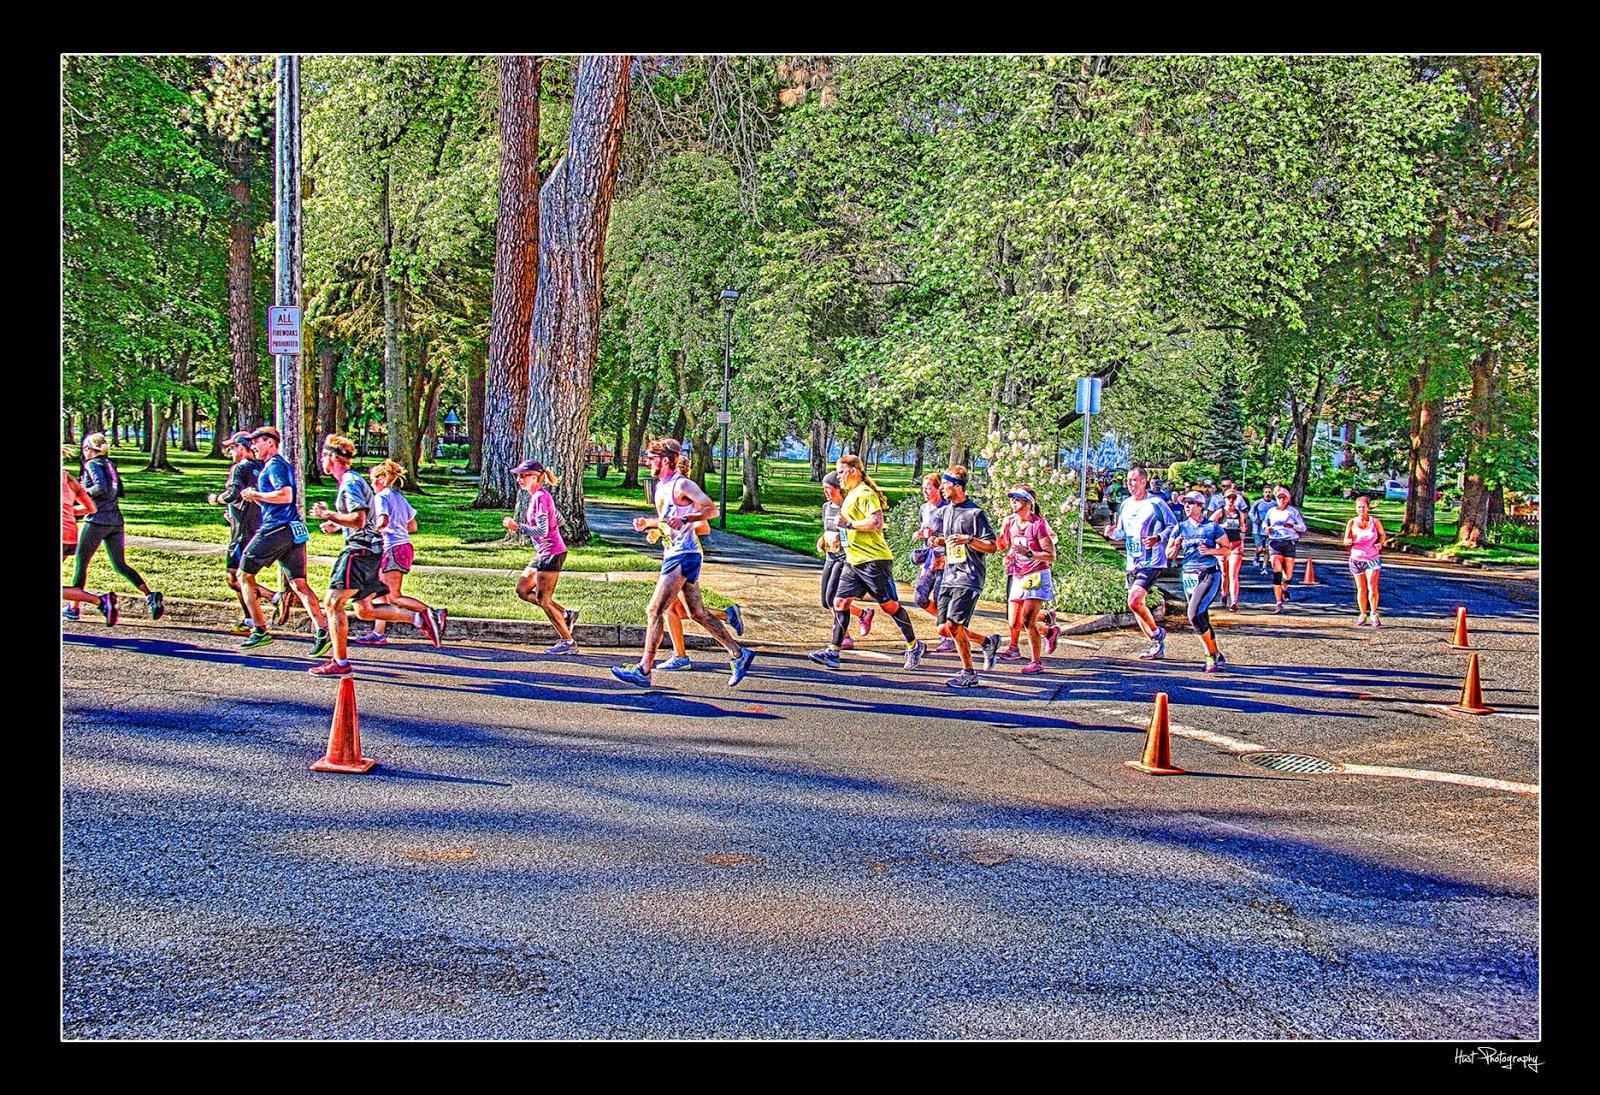 coeur d alene marathon